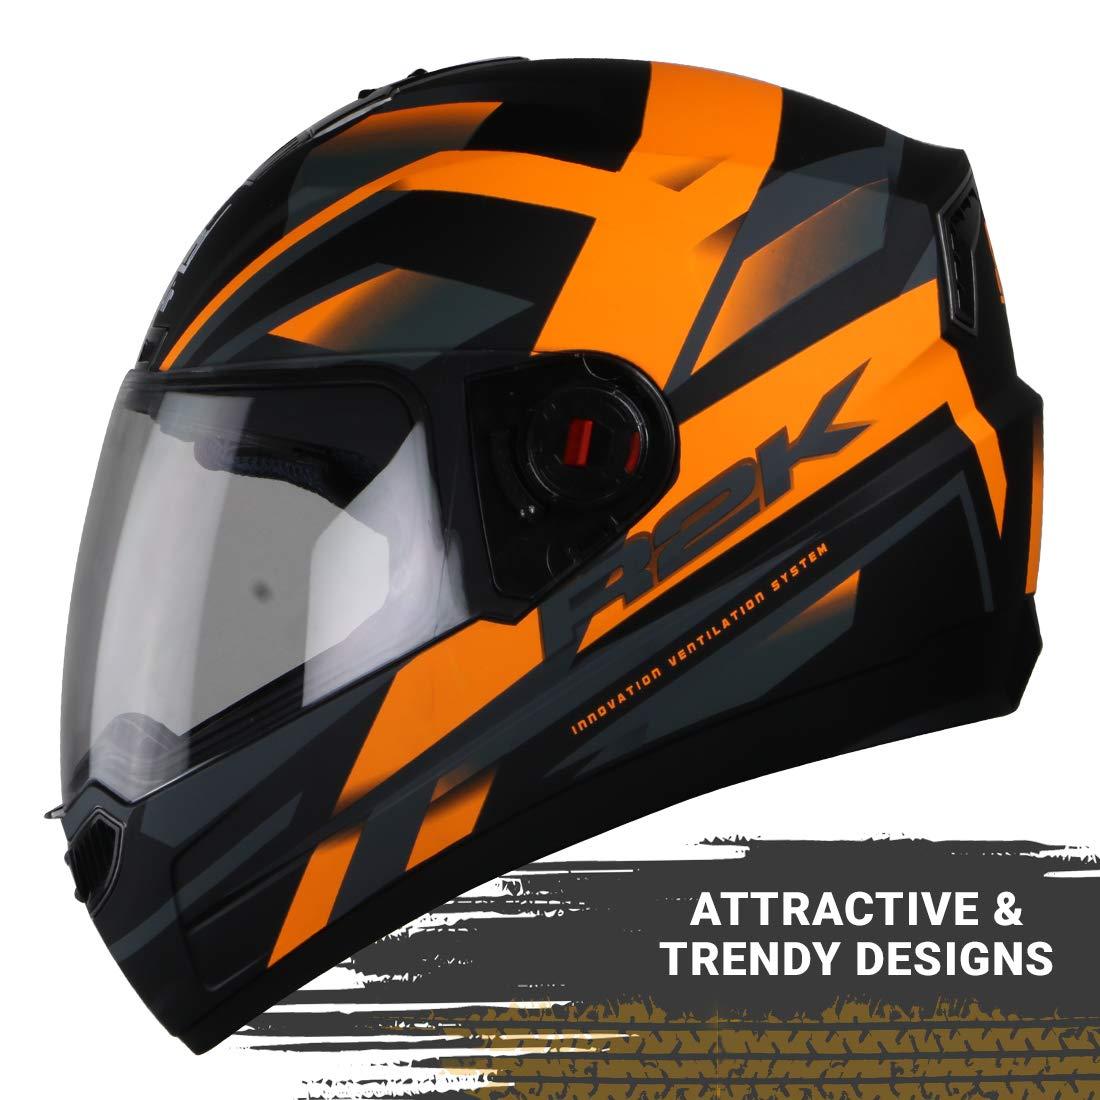 Stylish Matt Black Orange Color Steelbird SBA-1 R2K Full Face Graphics Helmet